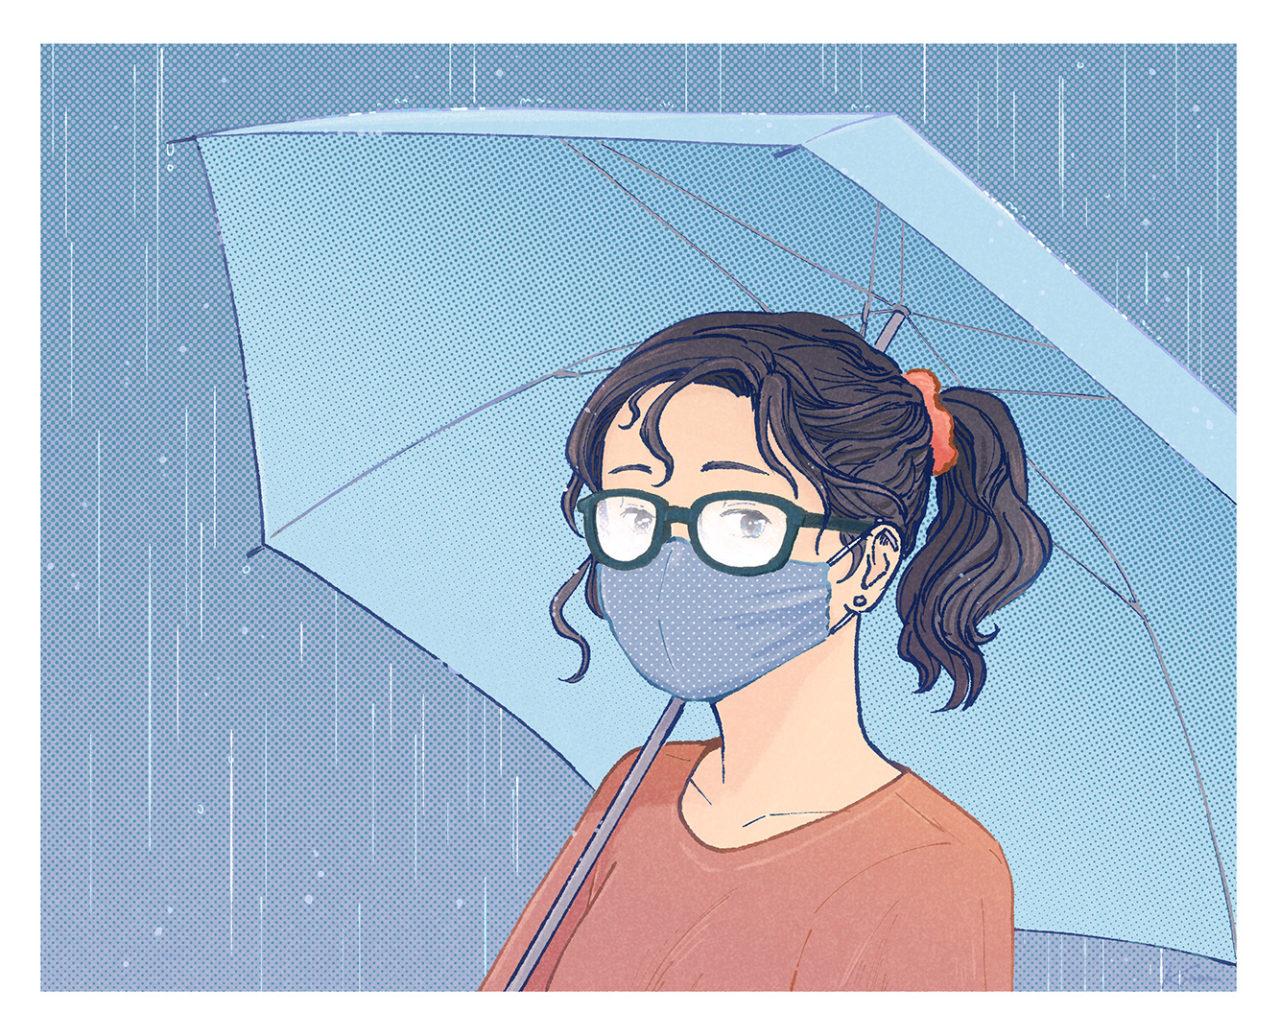 Foggy - art drawing by Kinomi